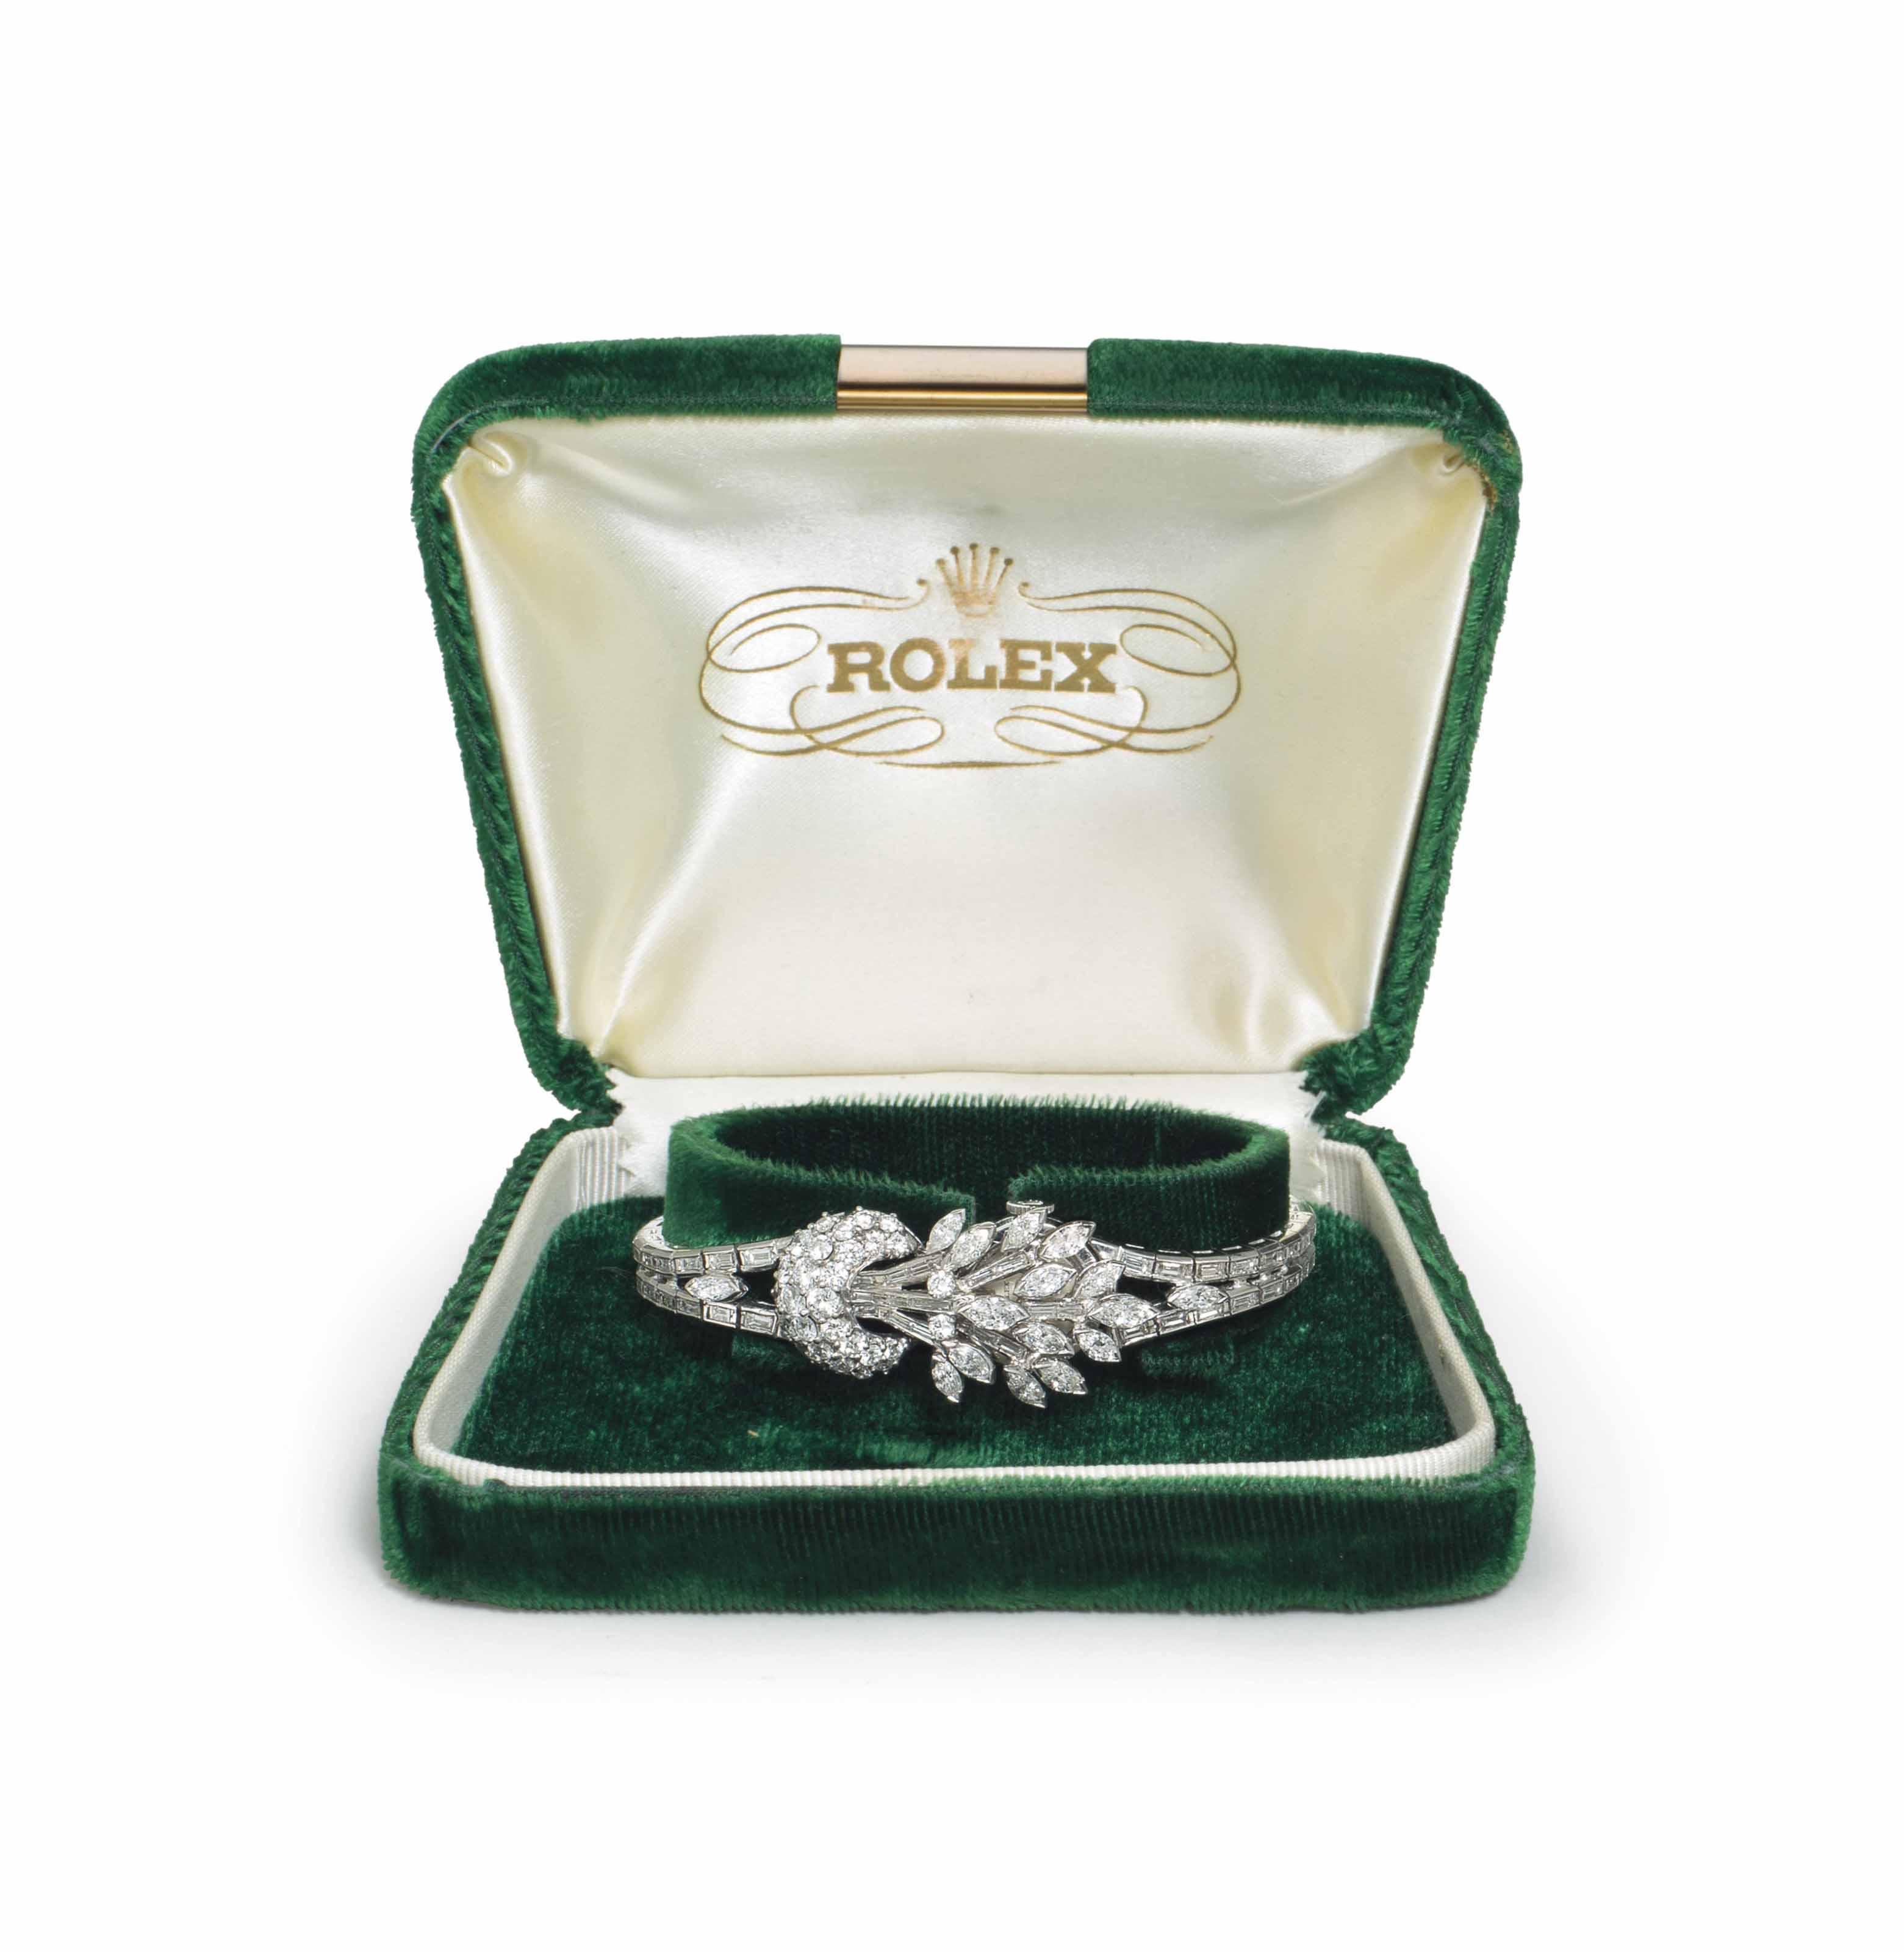 Rolex. A Lady's Very Fine Plat